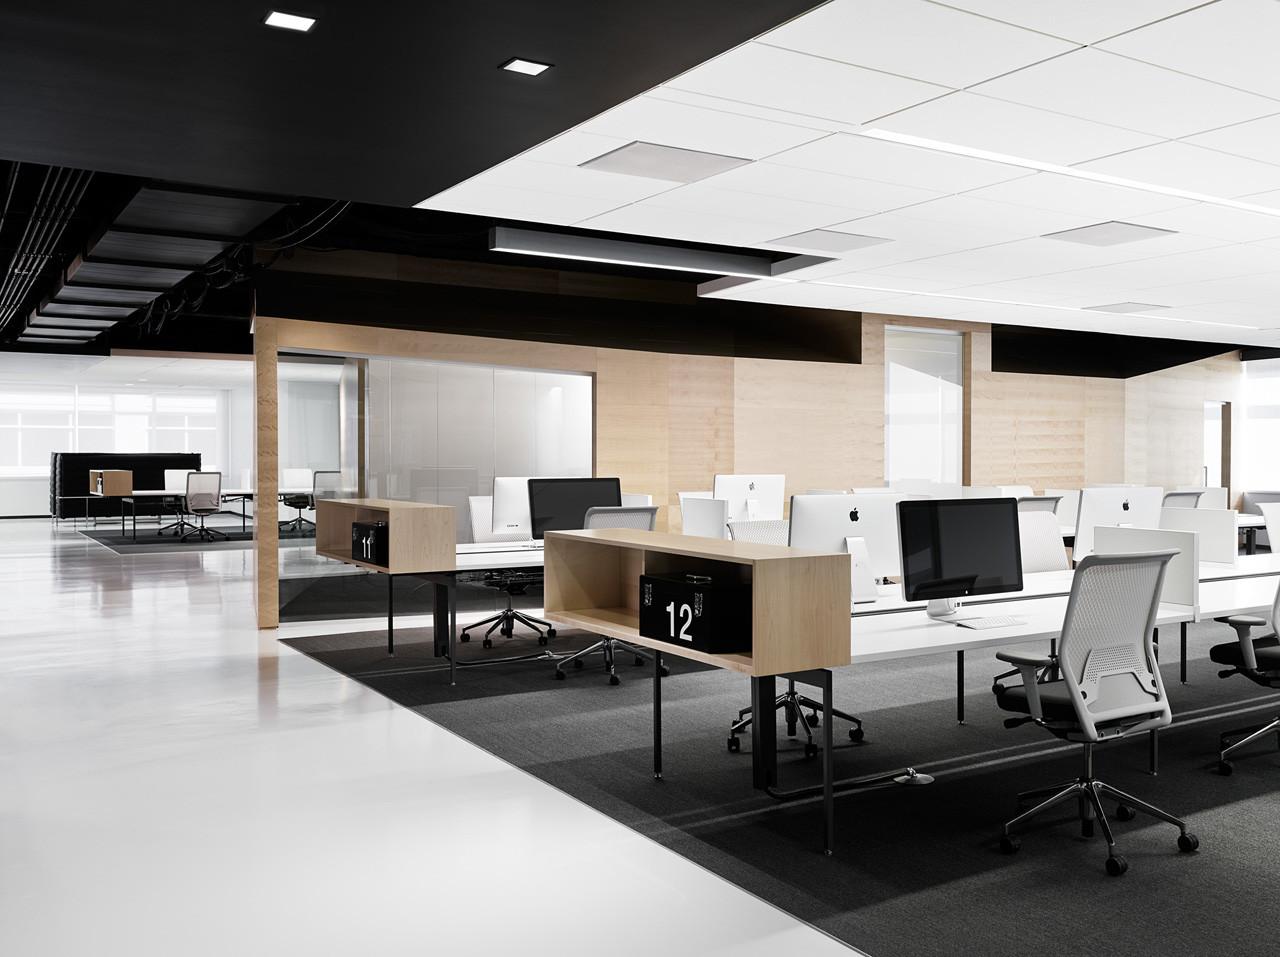 Techshed / Garcia Tamjidi Architecture Design